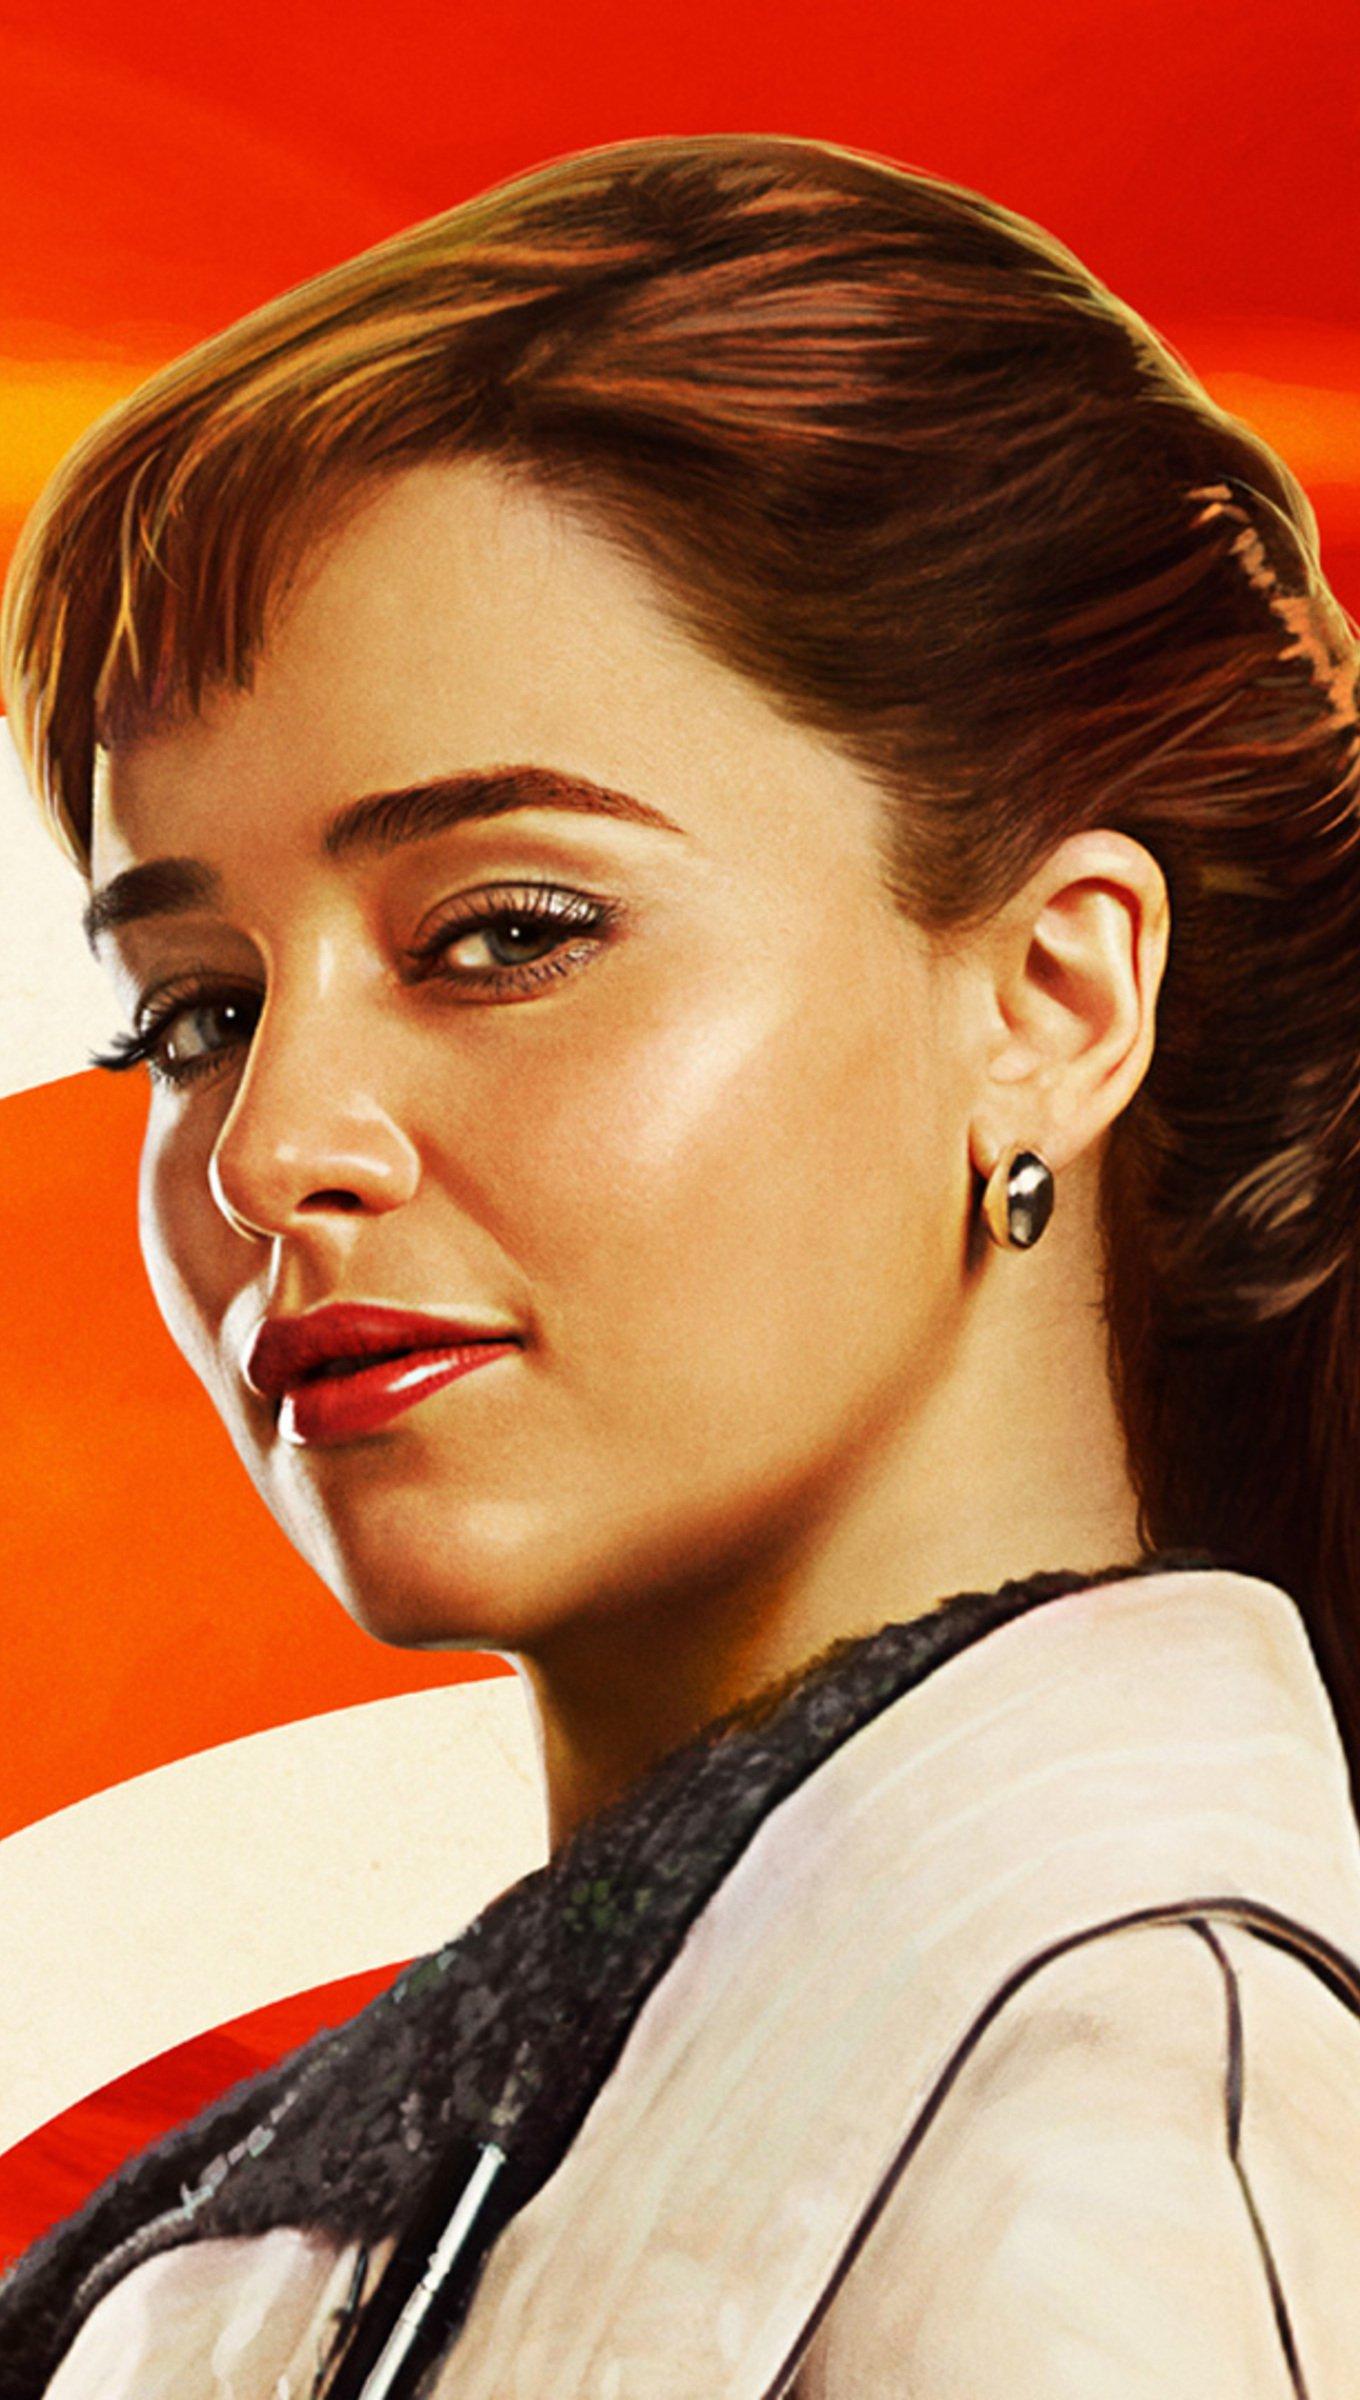 Fondos de pantalla Emilia Clarke como Qira Fanart Vertical